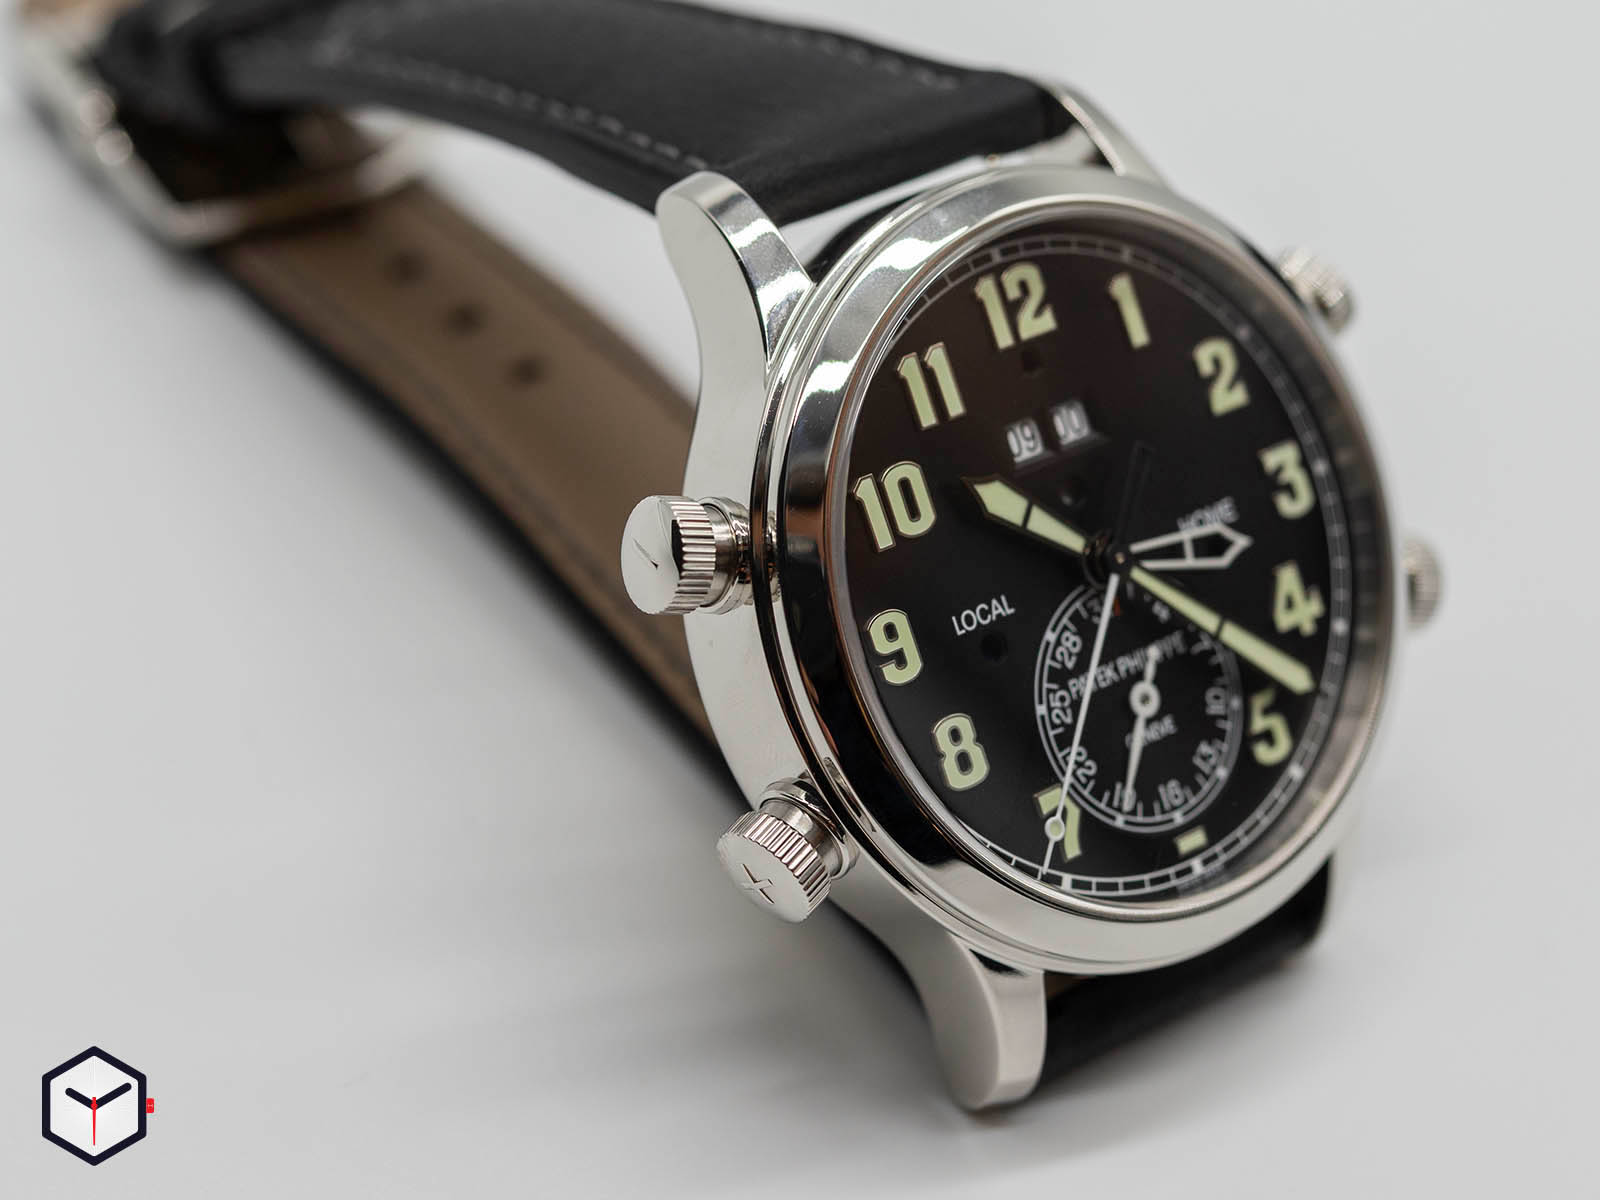 mechanical-alarm-watches-patek-philippe-5520p-2.jpg